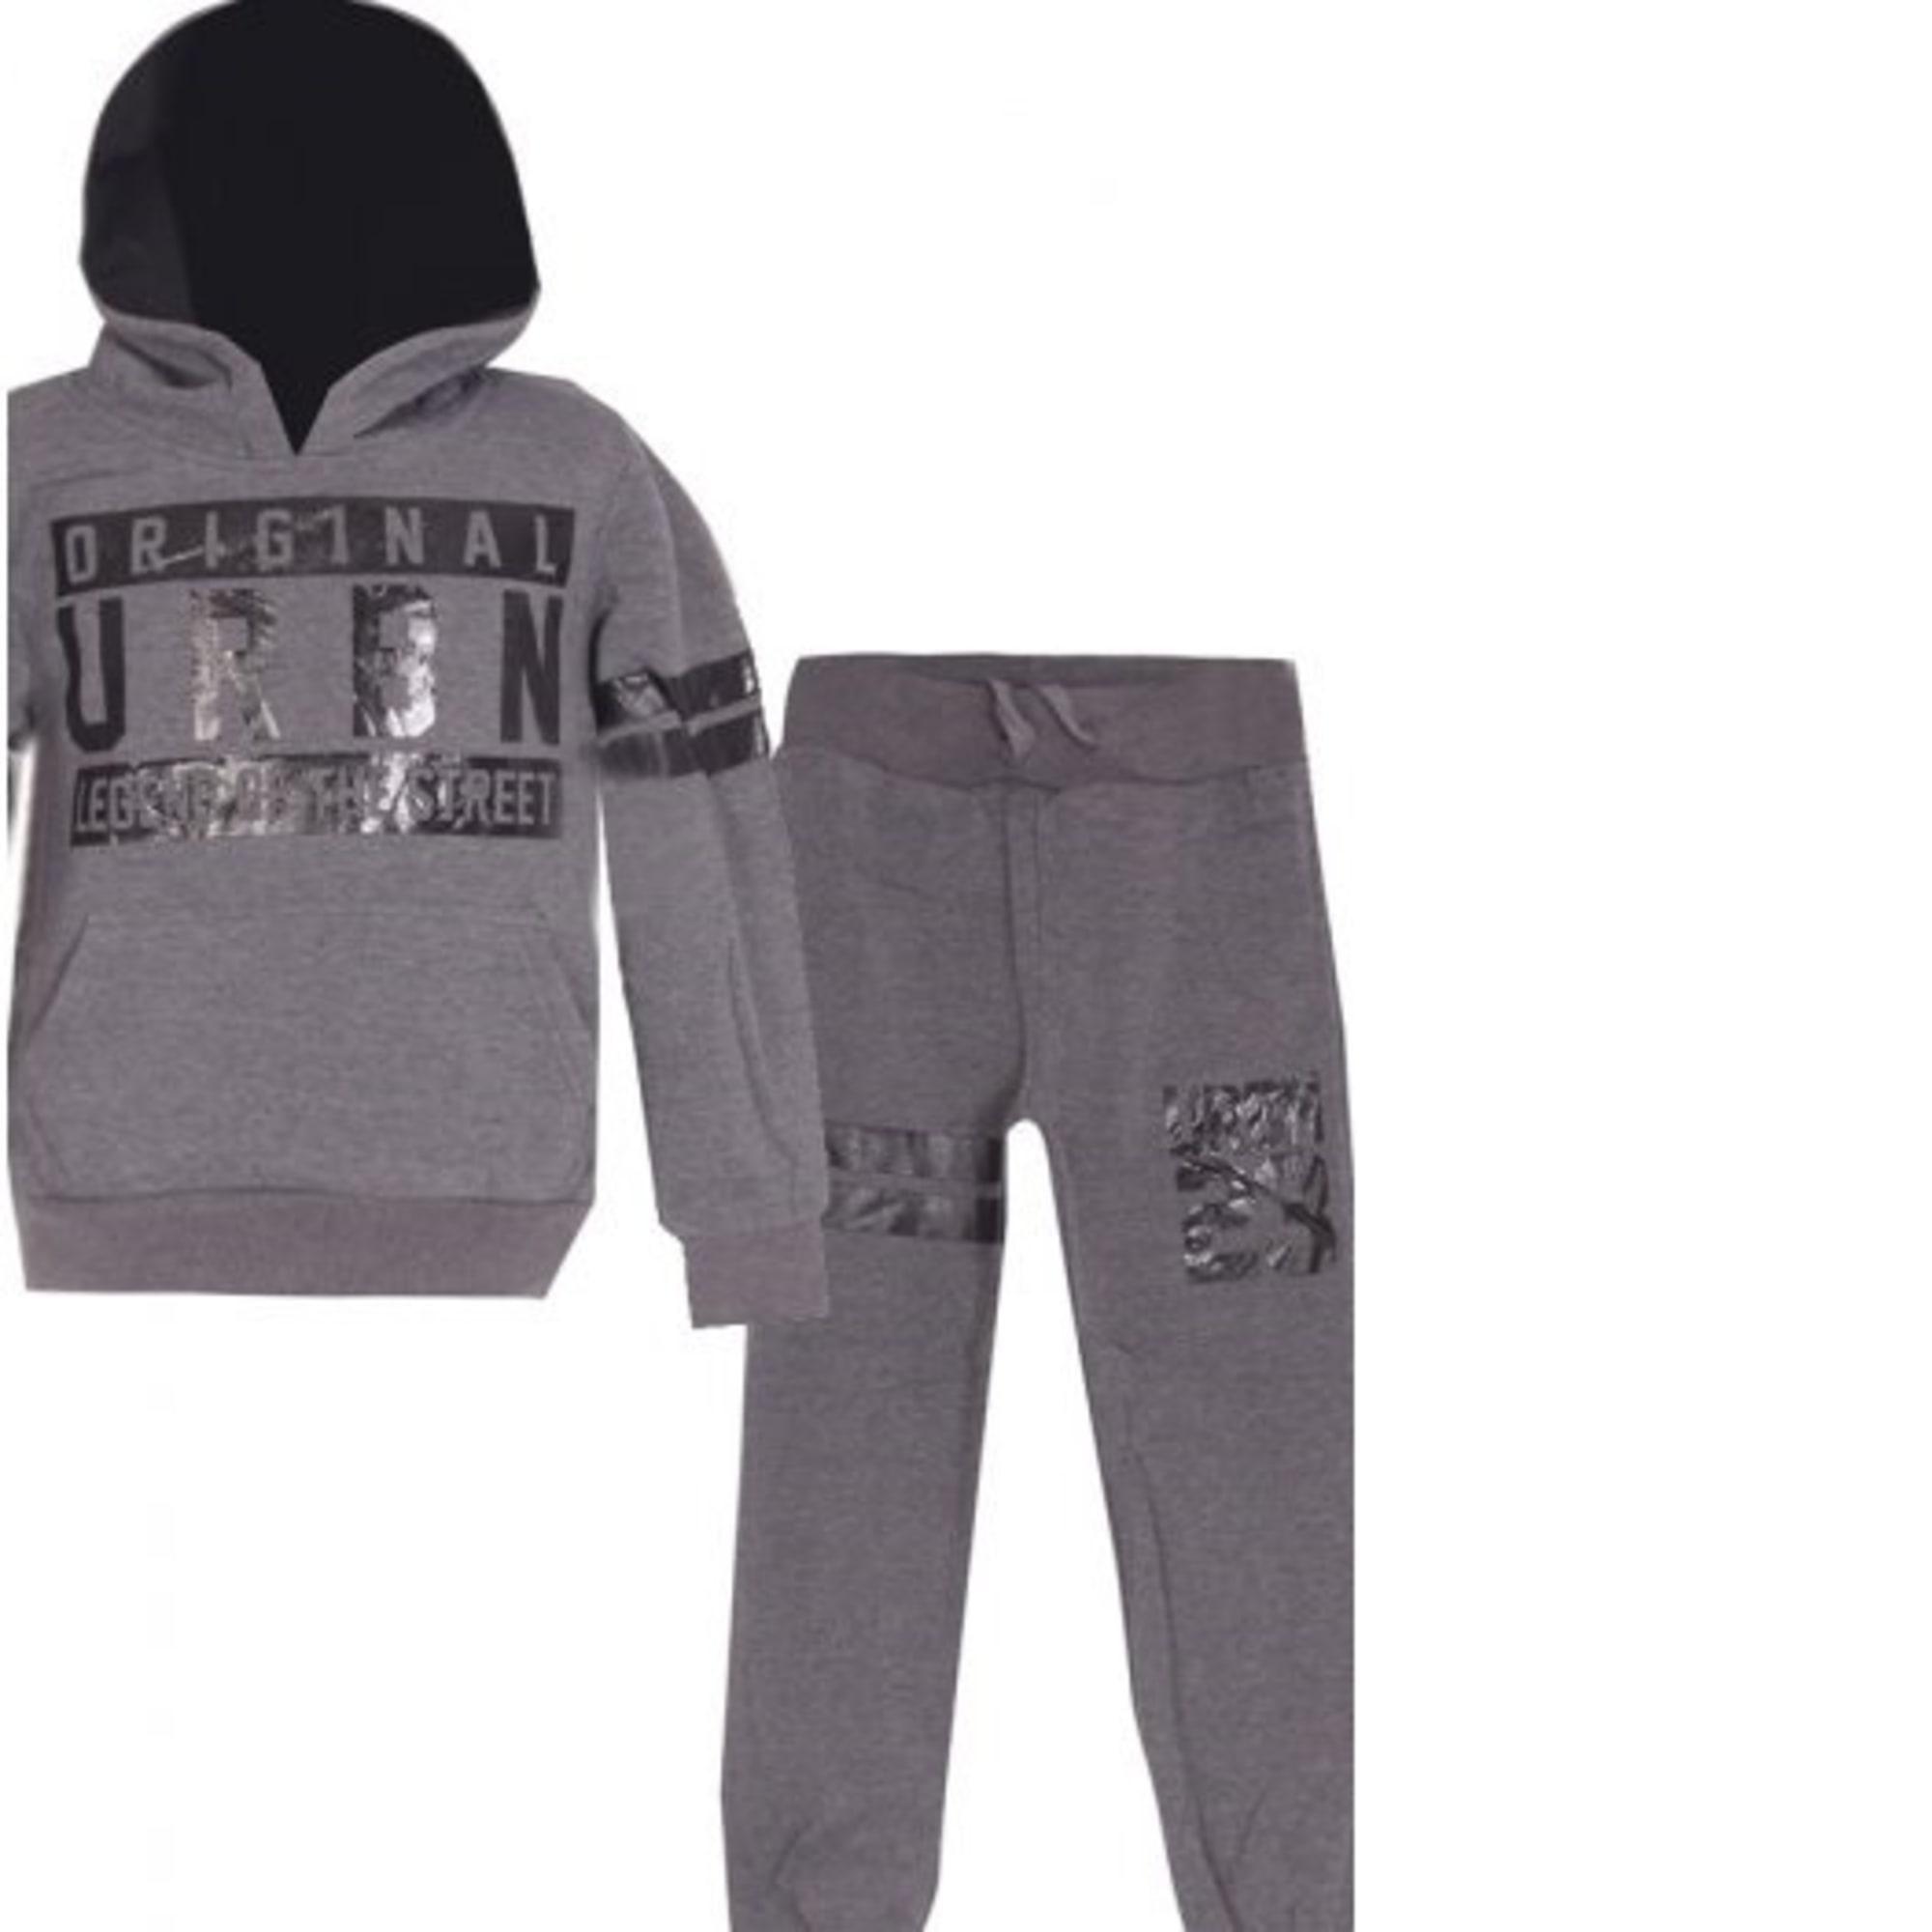 Pants Set, Outfit ORIGINAL URBAN Black